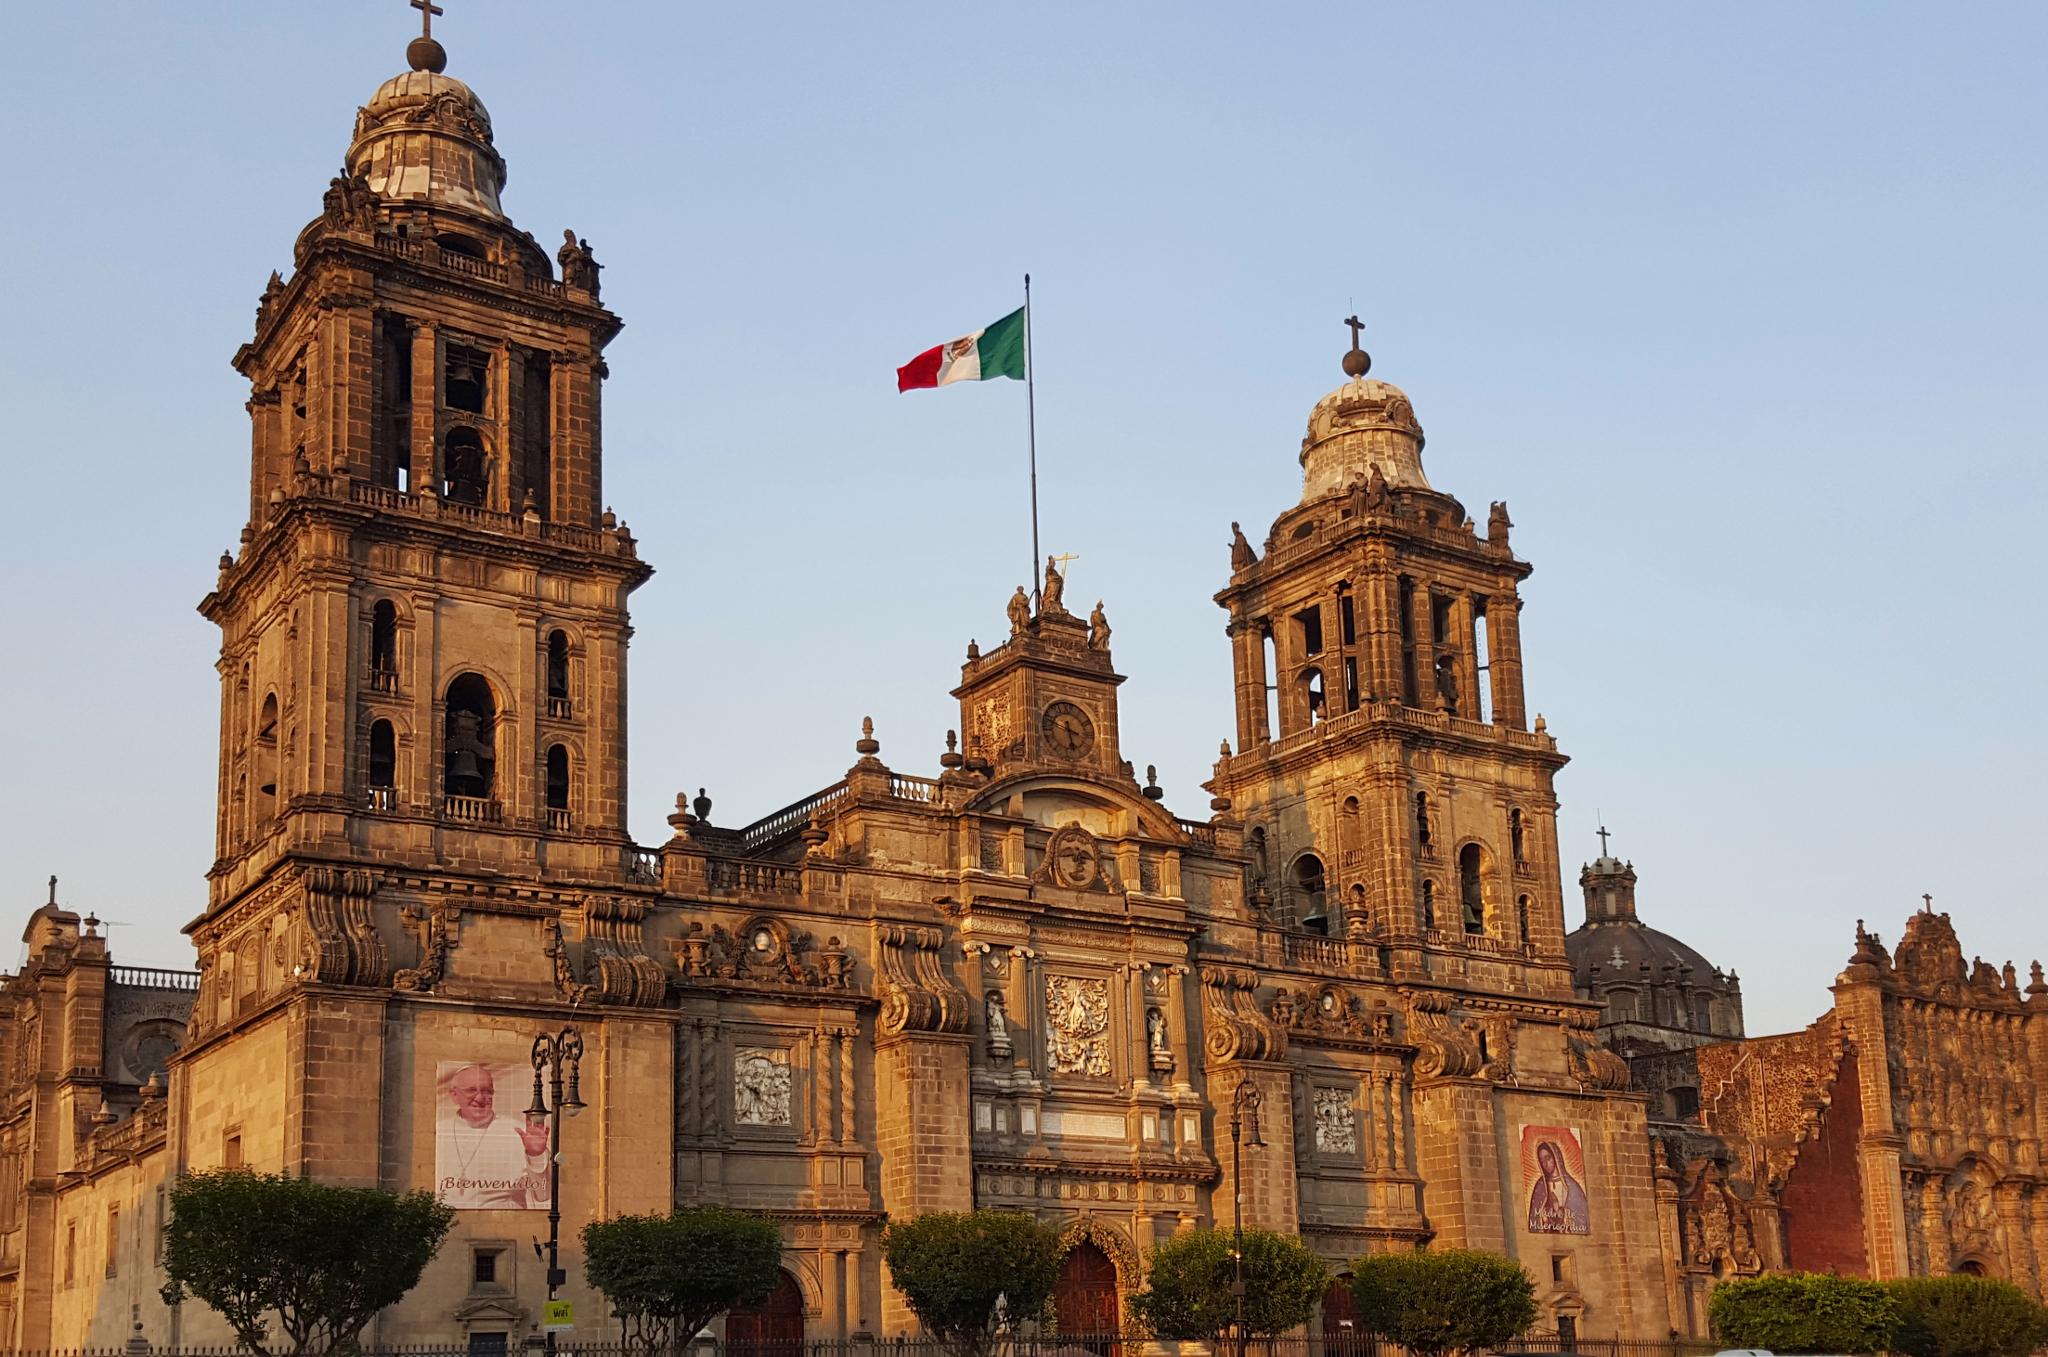 Mexico City (Blok 70, Flickr)